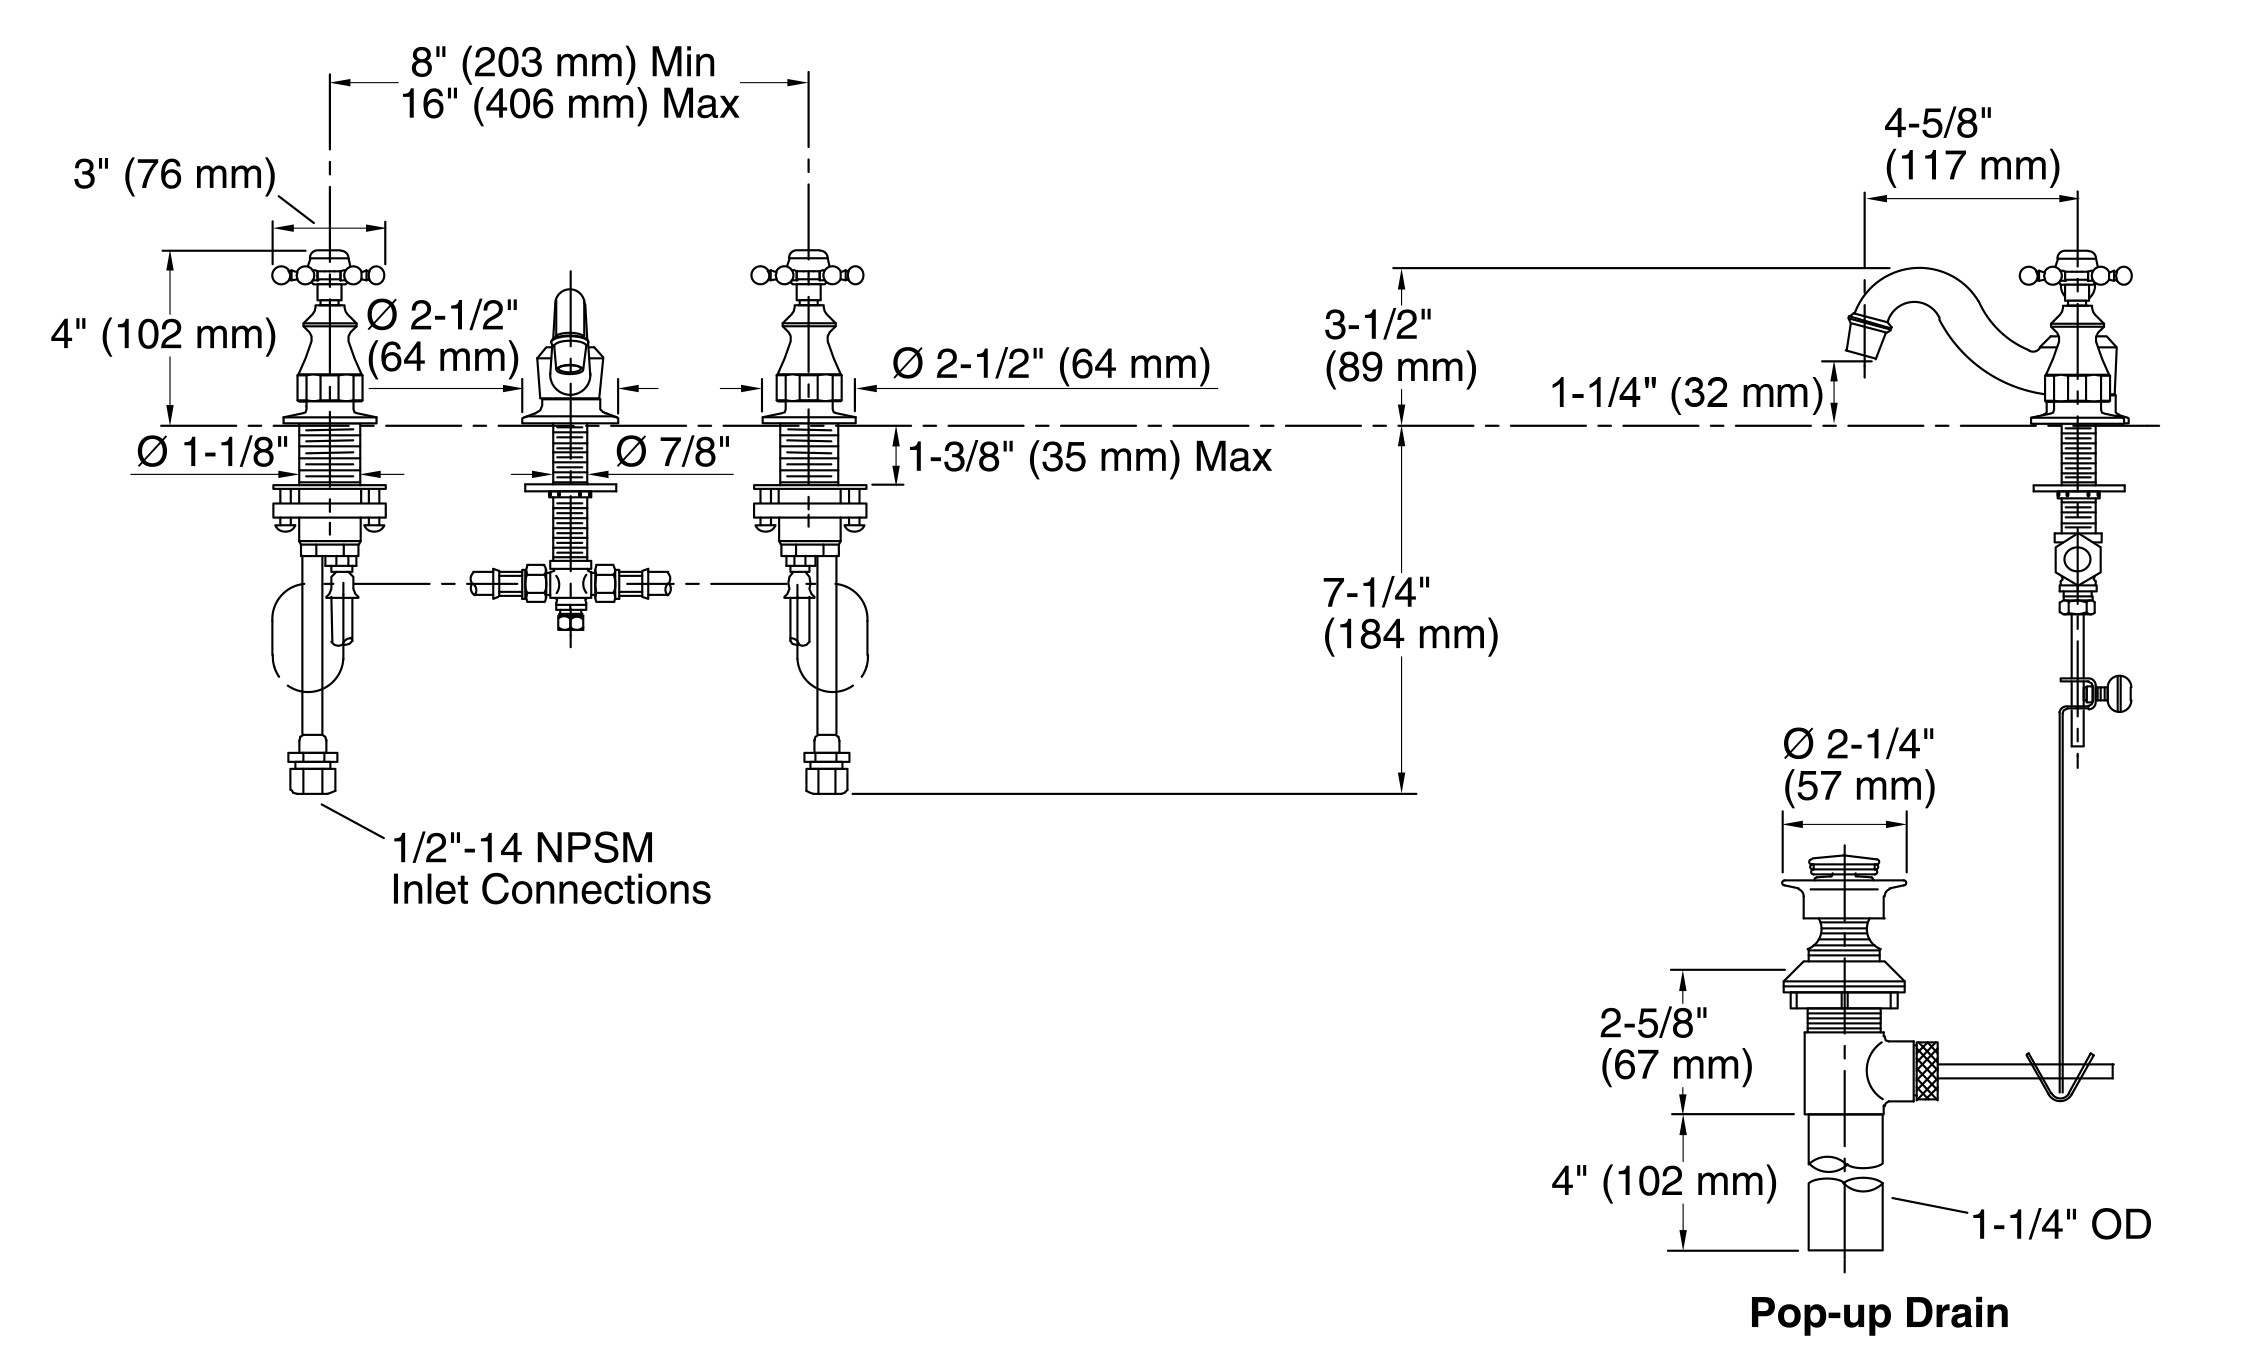 Kohler Engine Parts Diagram Tips & Ideas Outstanding Kohler Faucet Parts for Remarkable Repair Of Kohler Engine Parts Diagram